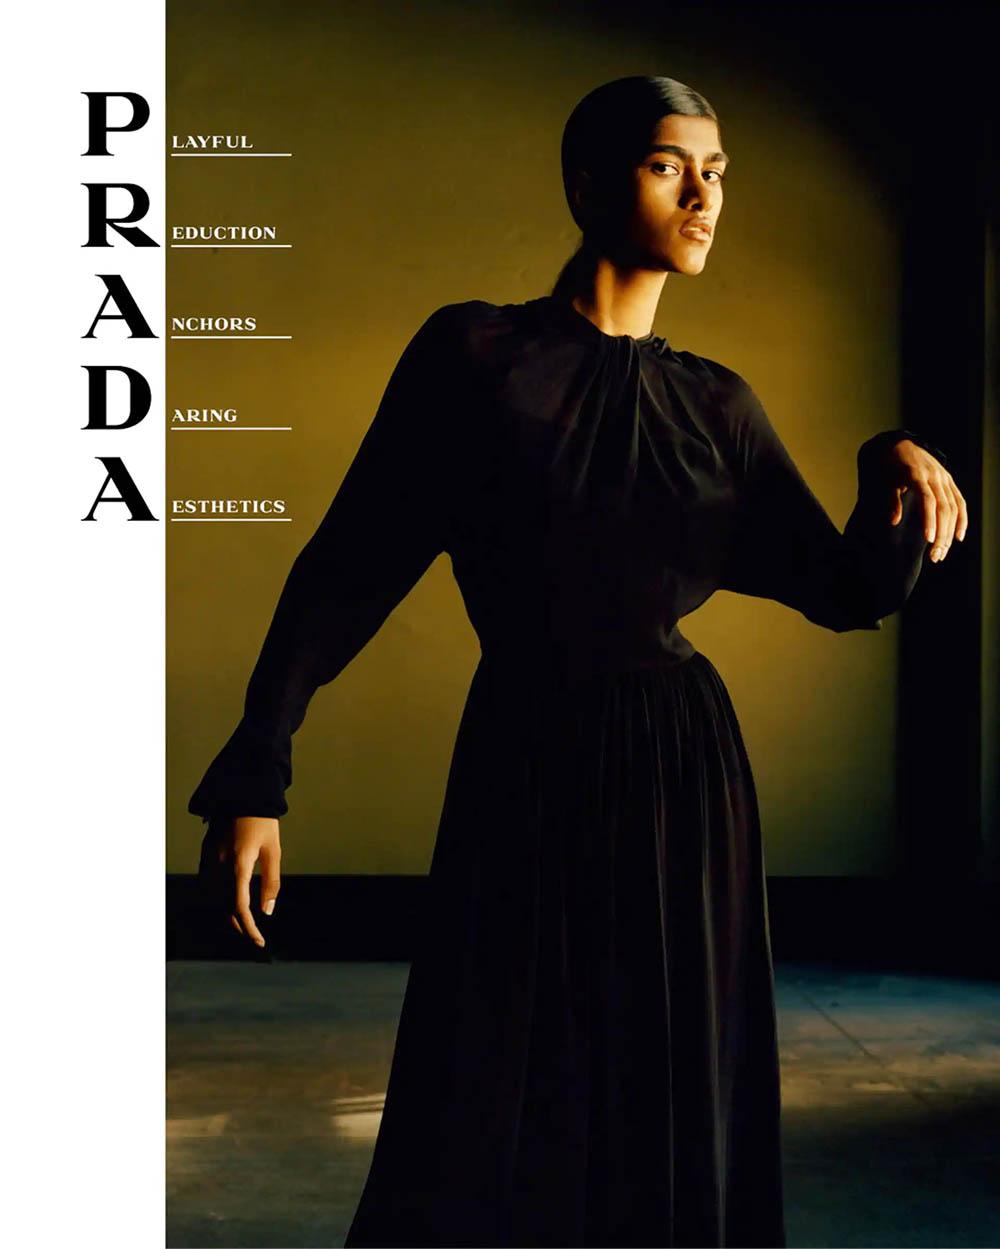 Prada Spring Summer 2020 Campaign